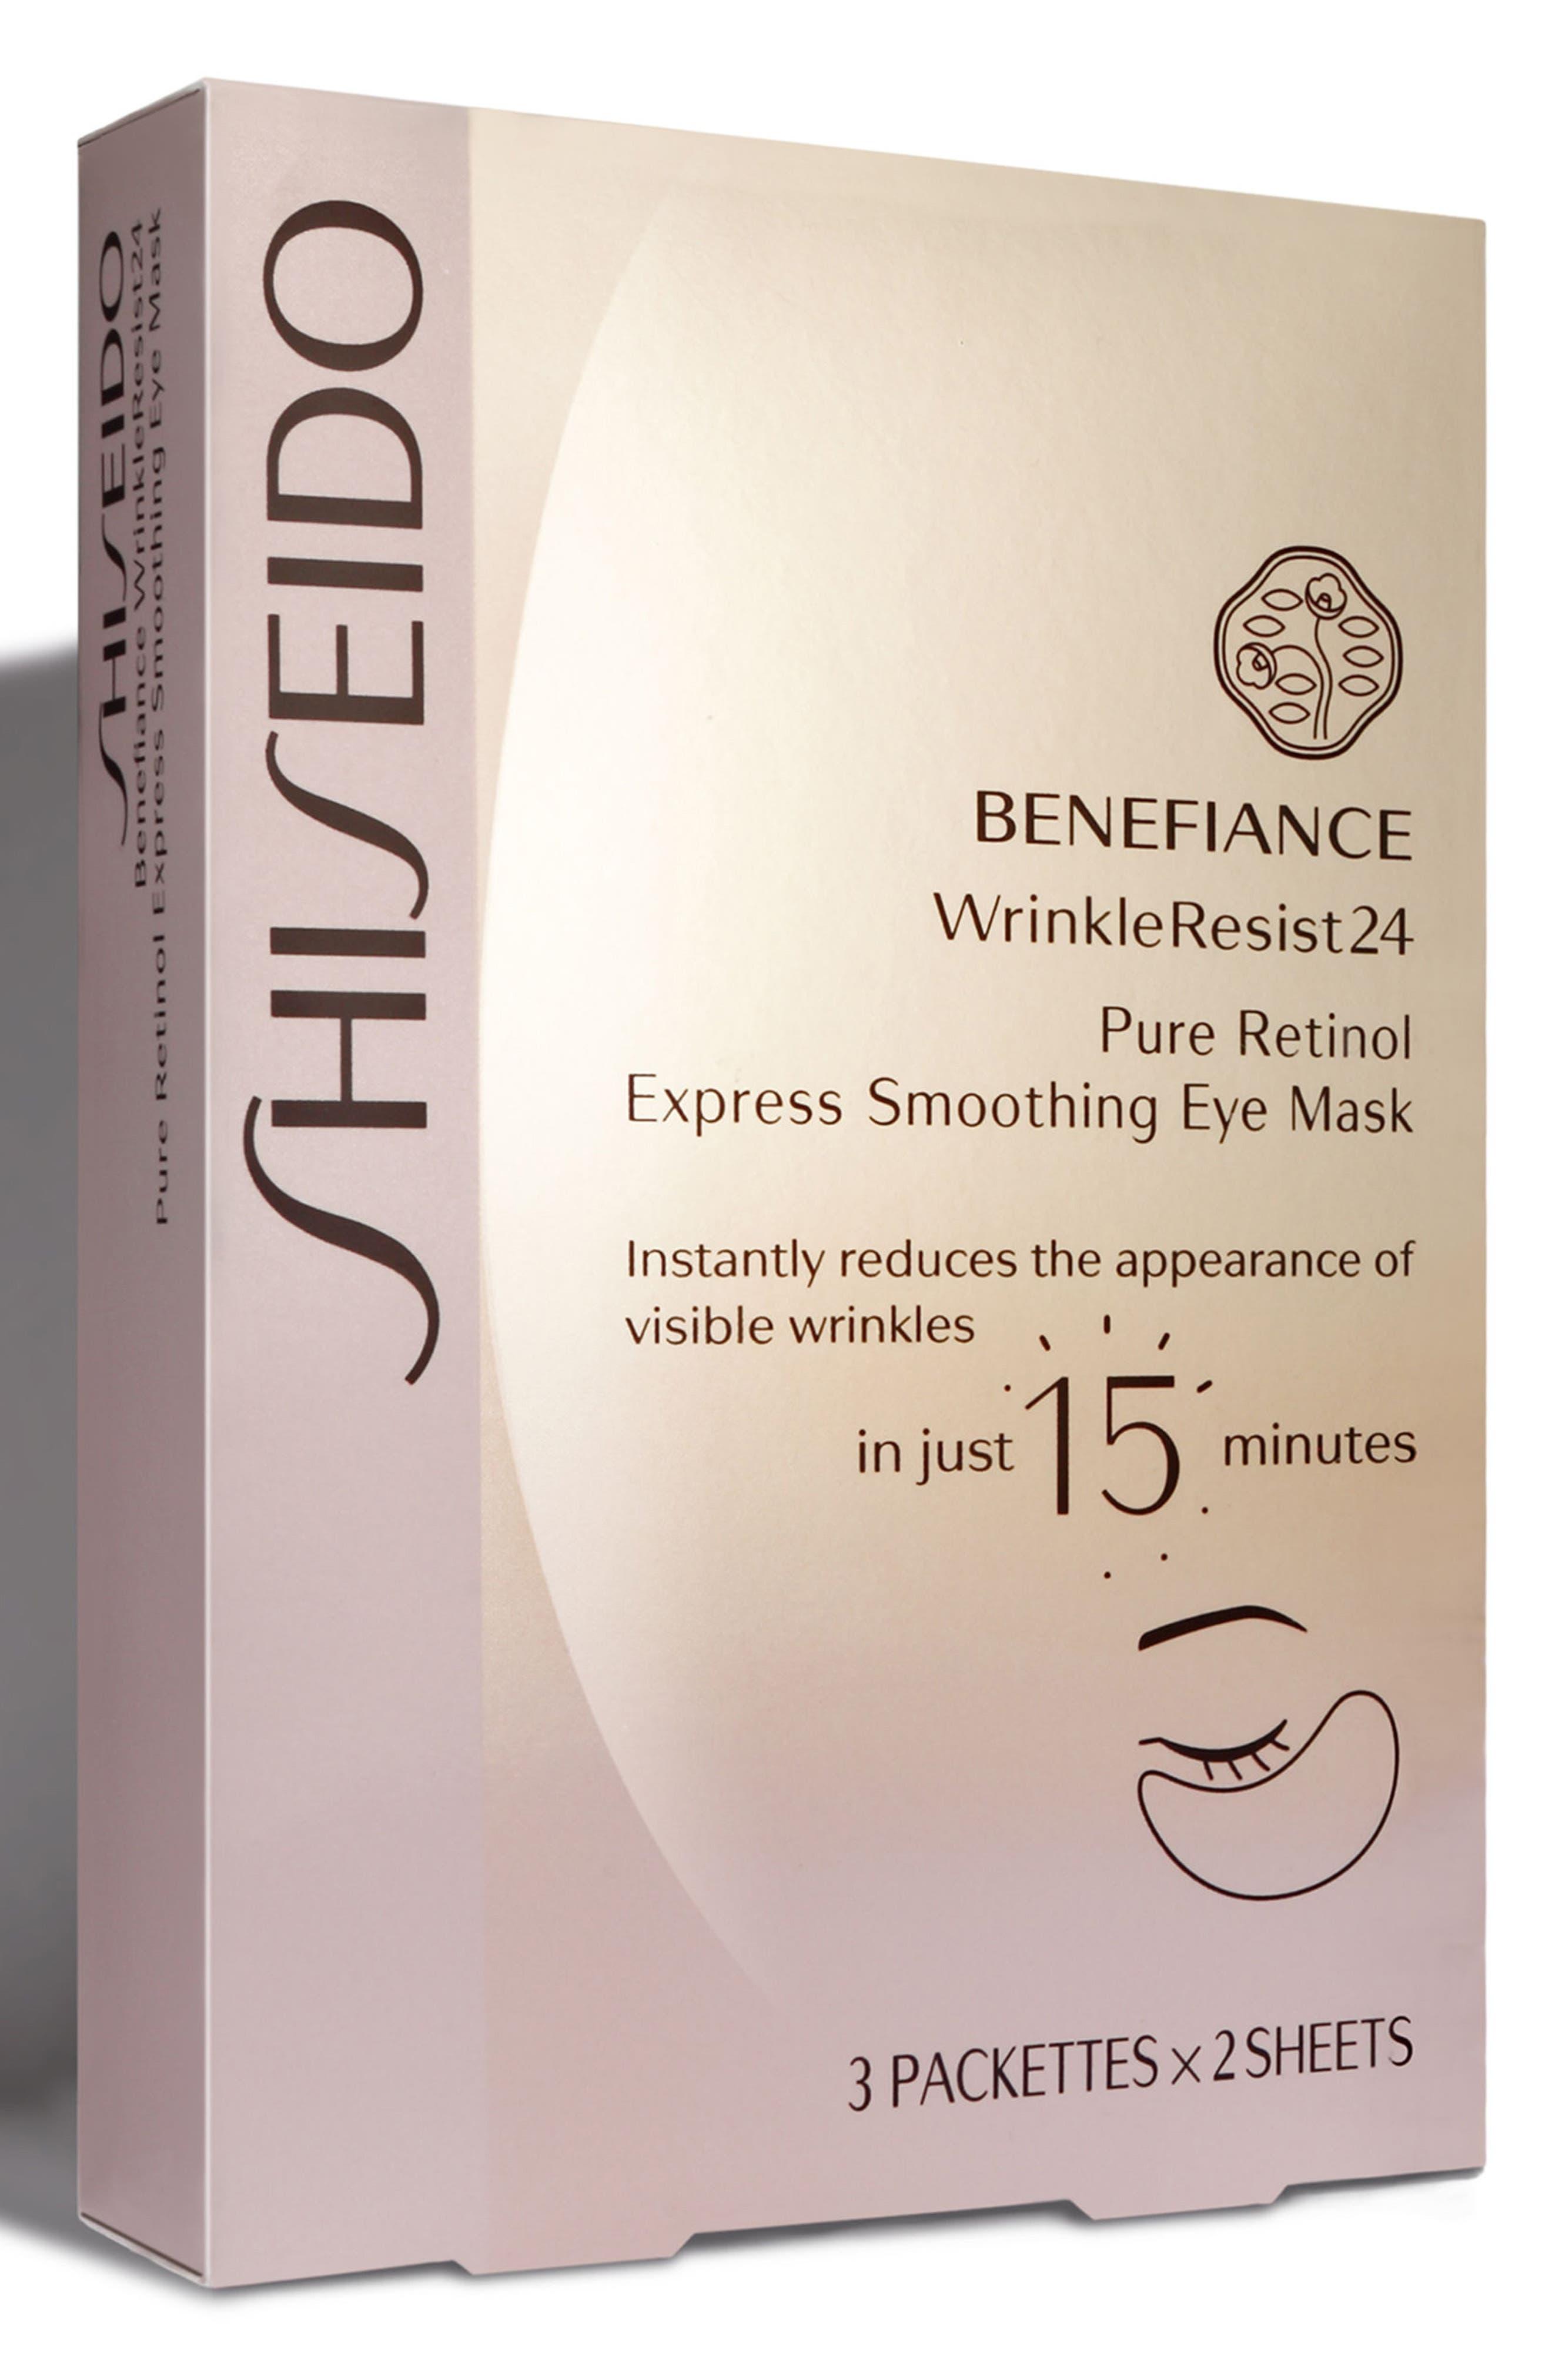 Benefiance WrinkleResist24 Pure Retinol Express Smoothing Eye Mask,                         Main,                         color, 000